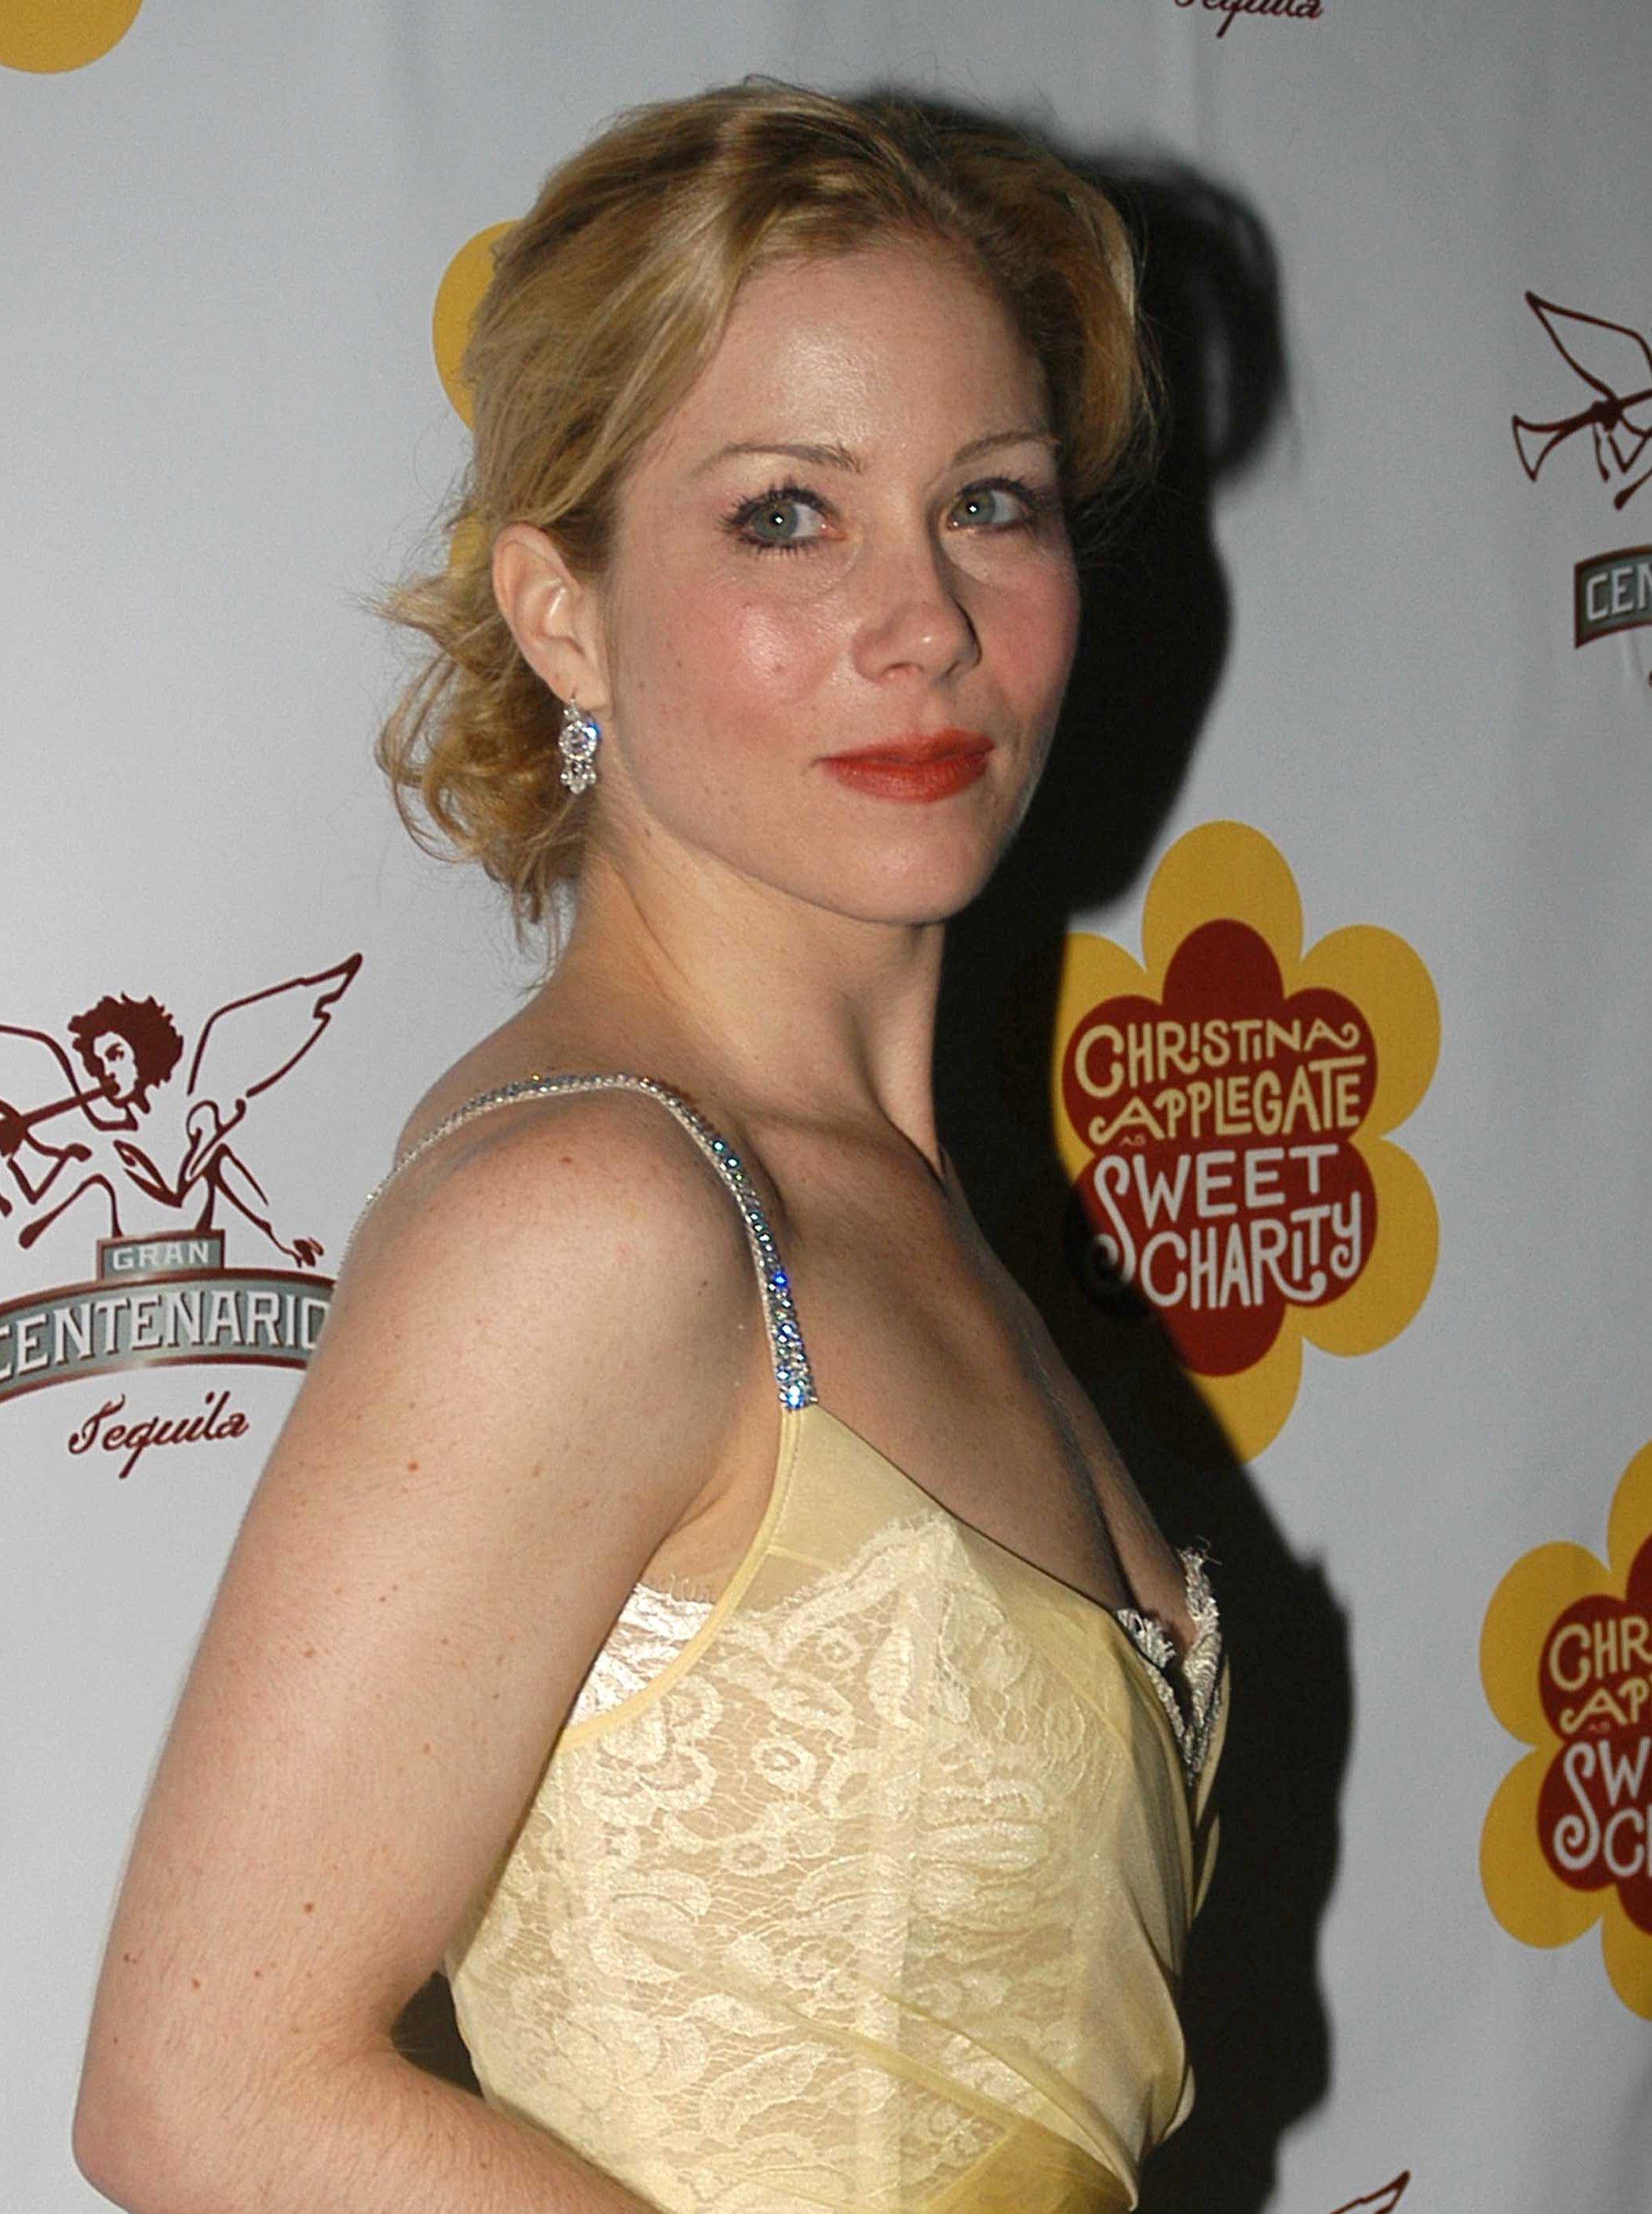 Christina Applegate | Celebrity Wiki - celebrity.fandom.com